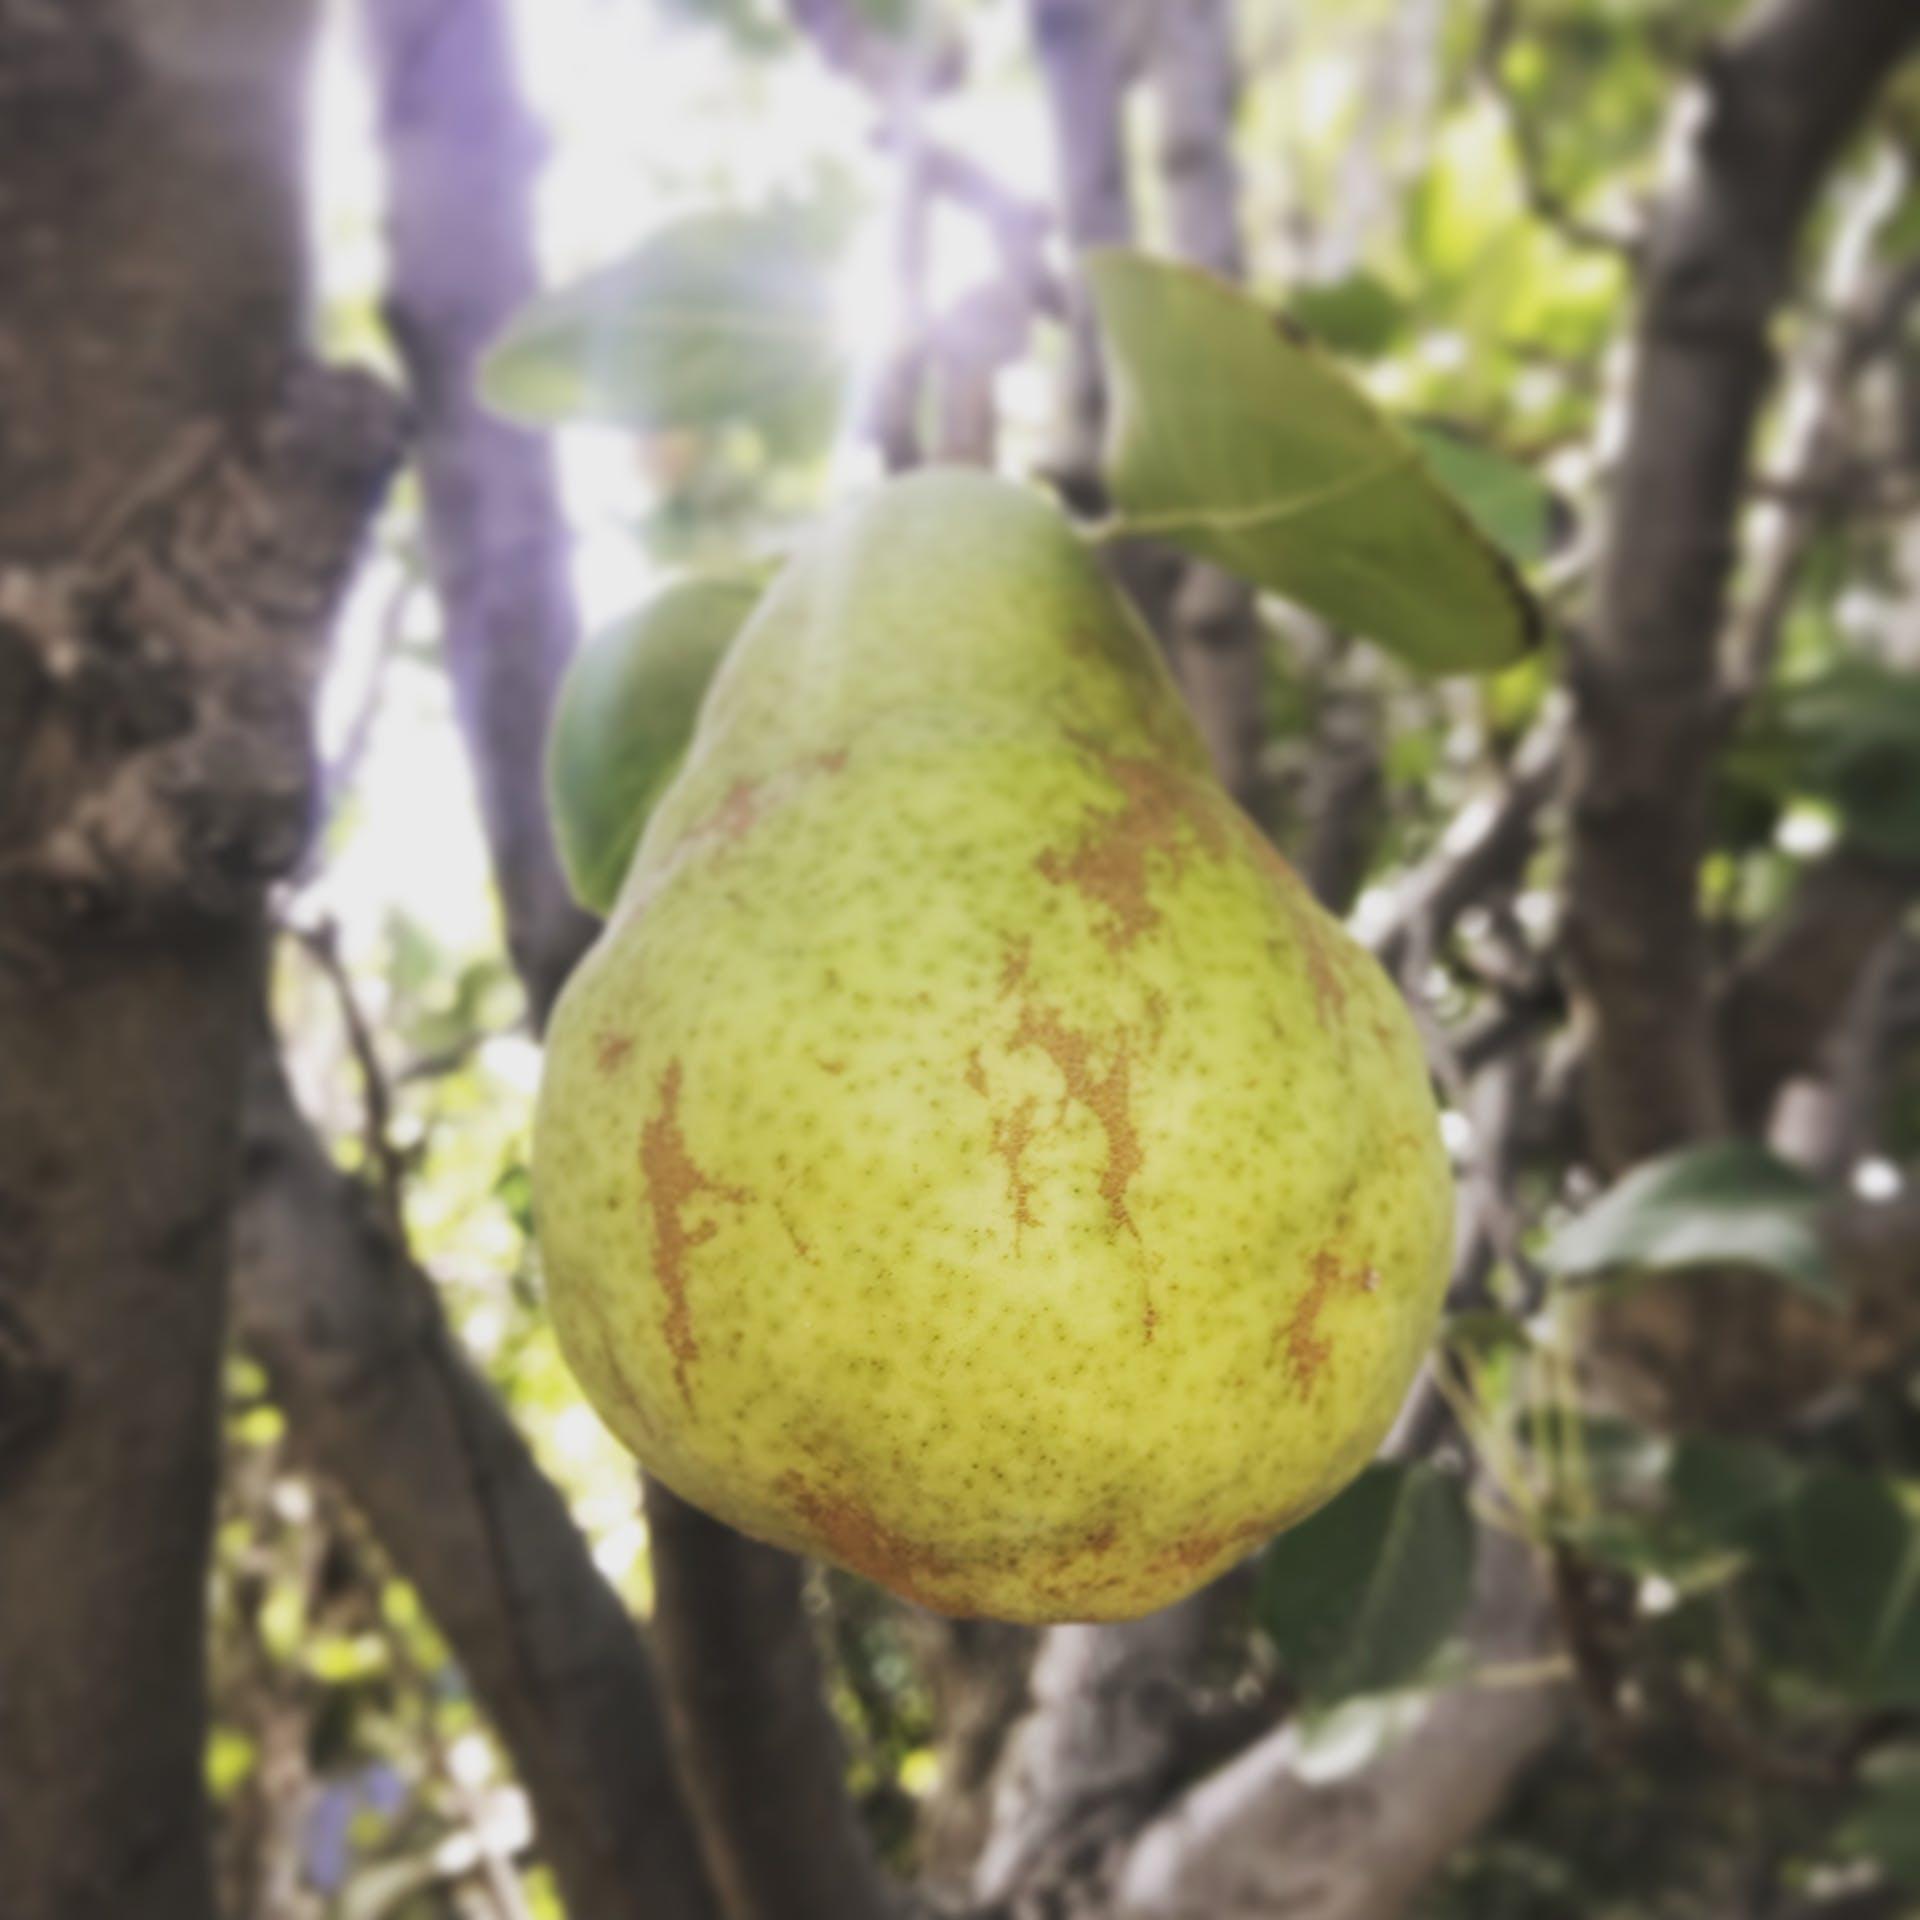 fruit fruit basket pear fruit tree fresh fruit